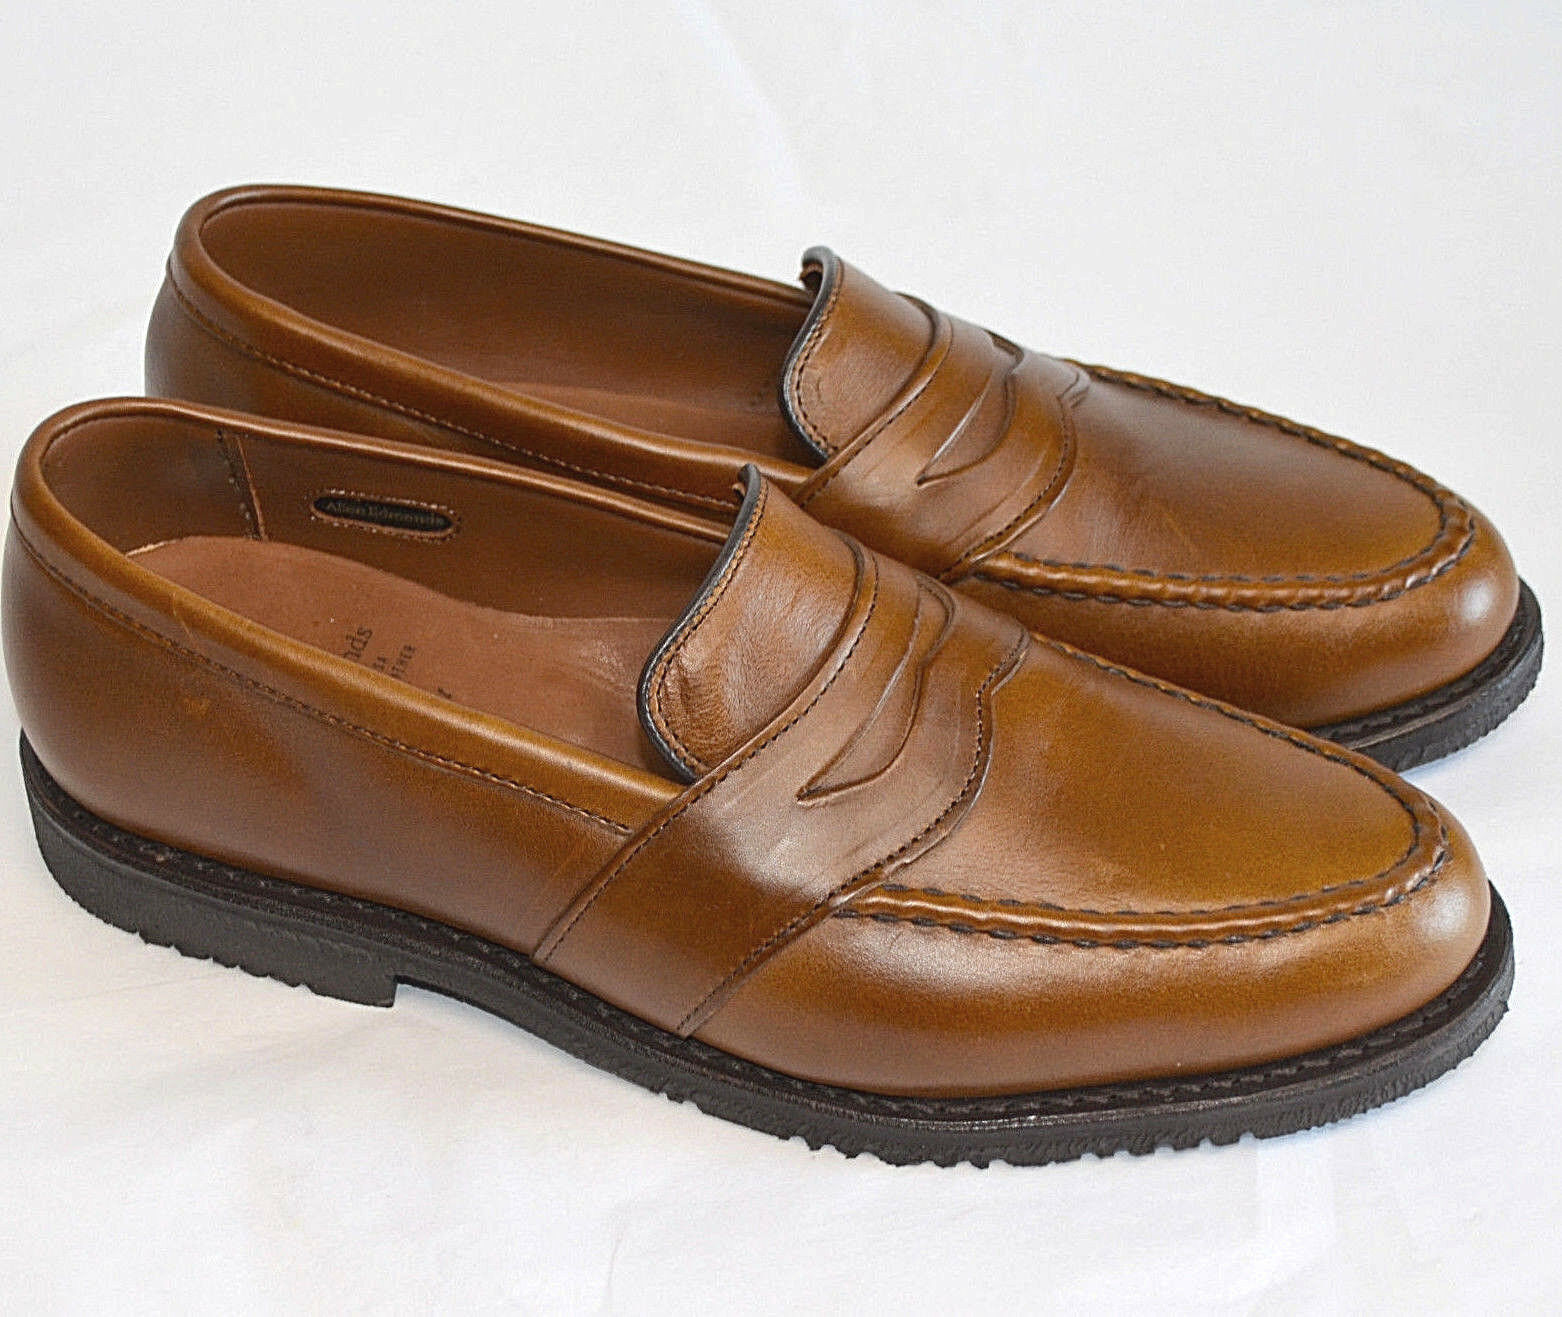 Allen Edmonds Fairmont Penny Mocasín Marrón Cuero Hombres 11D Vestido Informal Zapato Usa